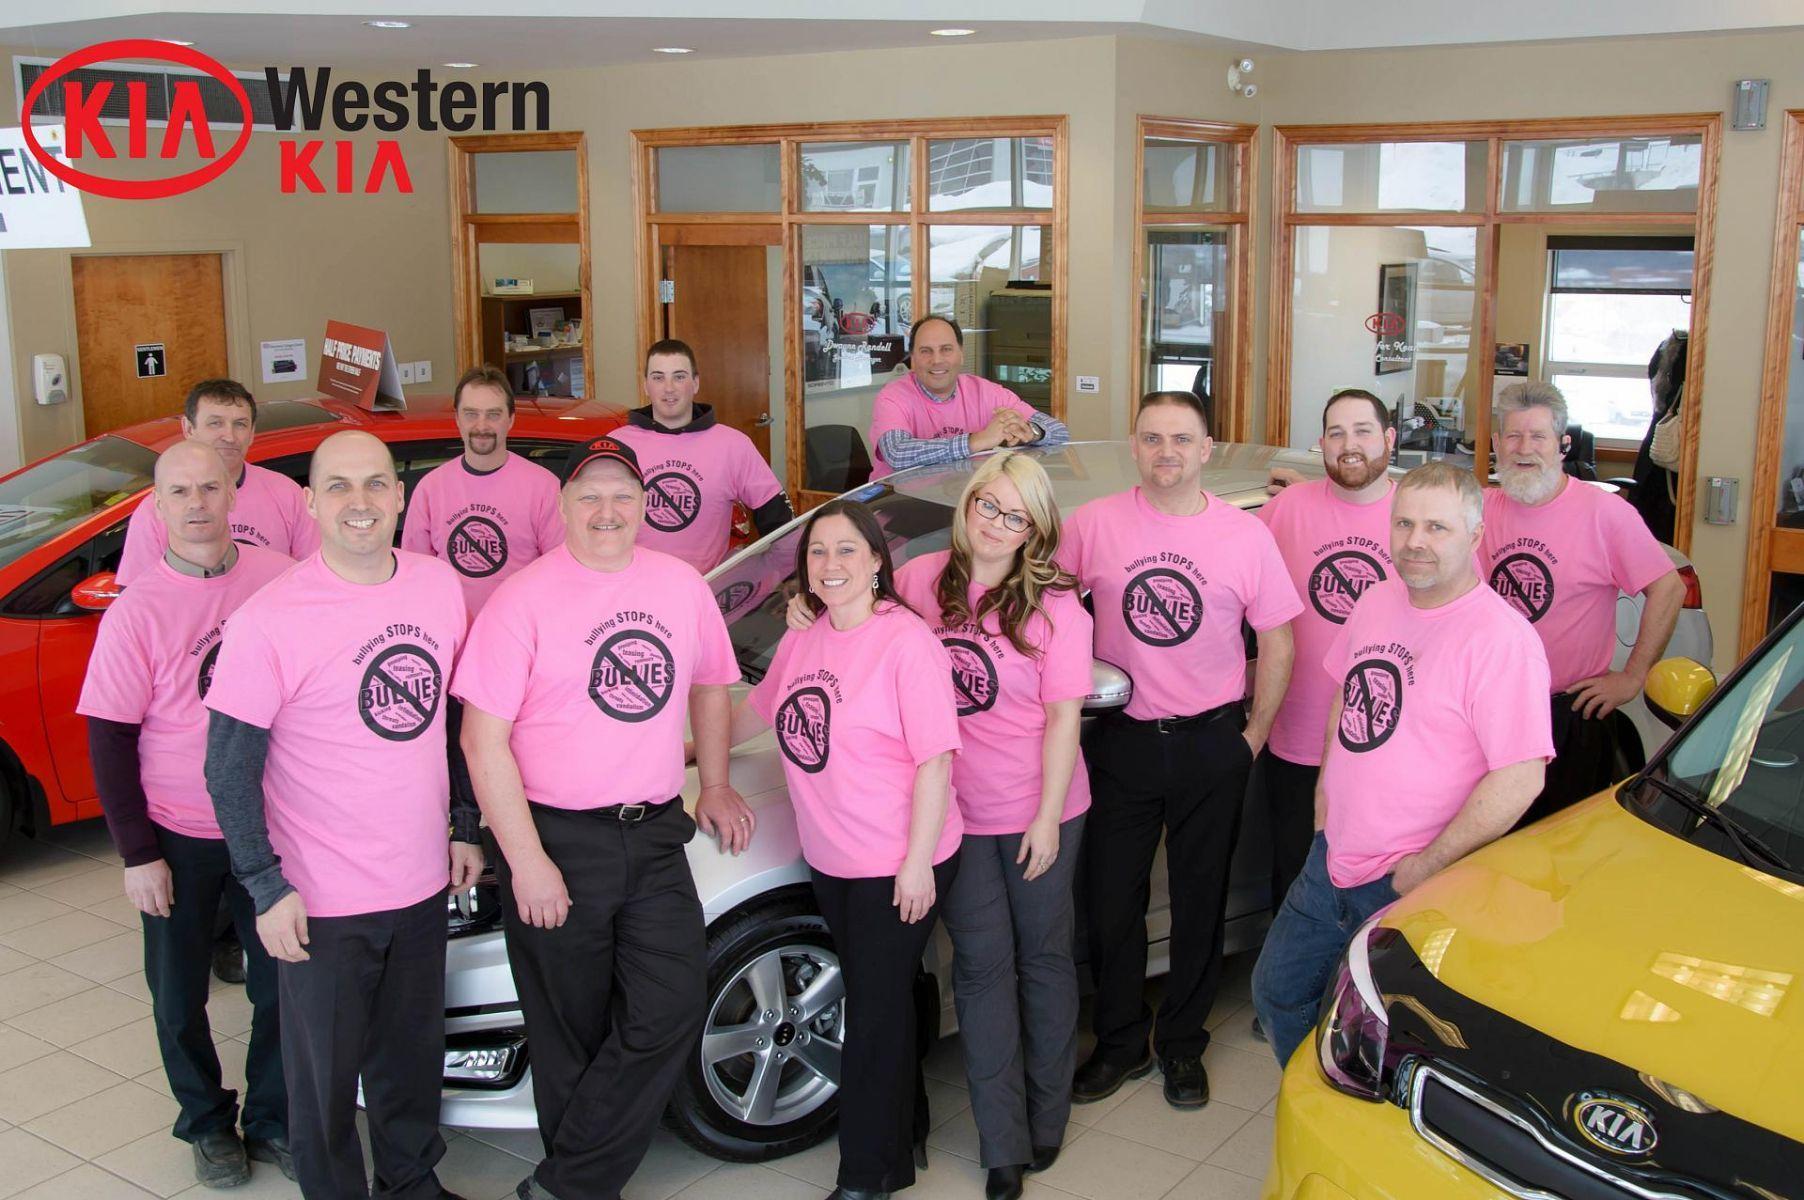 Western Kia Supports Anti-Bullying